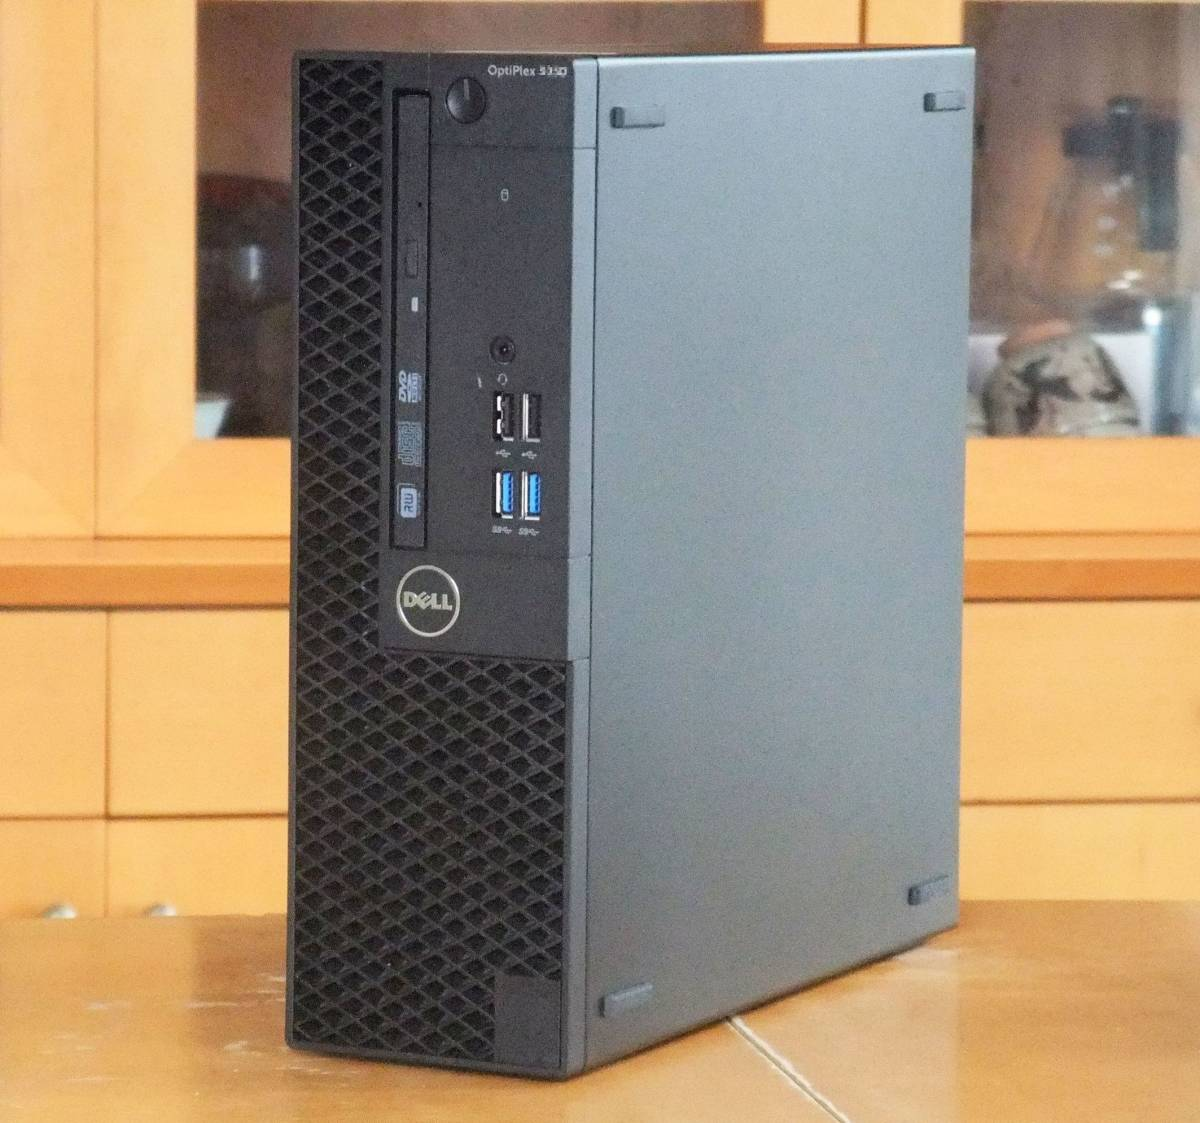 ■第7世代i7-7700 4.2Gx8/大容量32Gメモリ(DDR4)/新品SSD1TB/大容量HDD3TB/Office2019/Win10/USB3.0/税不要/領収証可/Optiplex3050